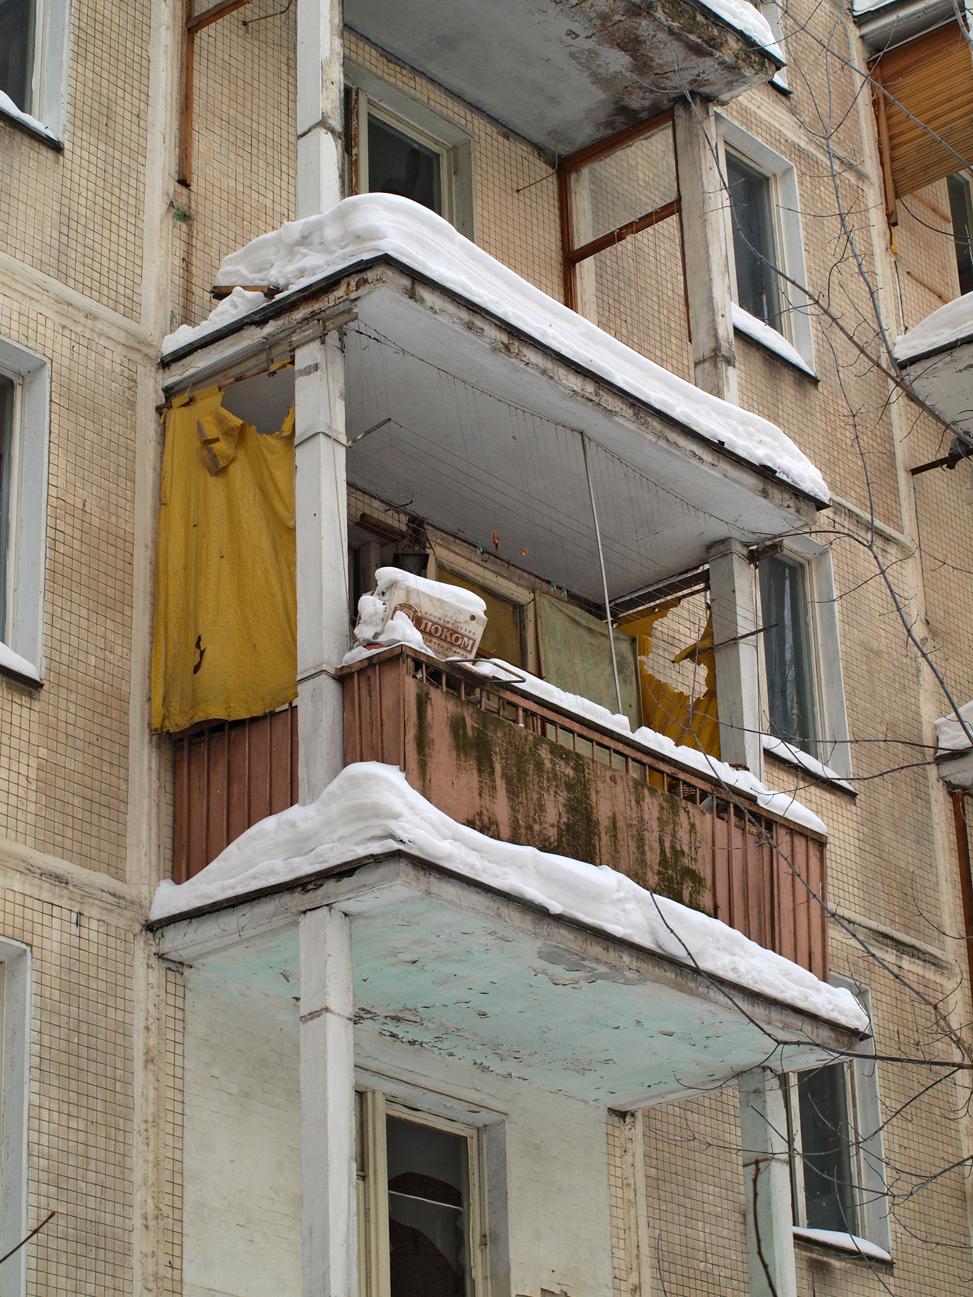 http://img-fotki.yandex.ru/get/5805/parktower99911.35/0_41f09_ea9d6dd6_orig